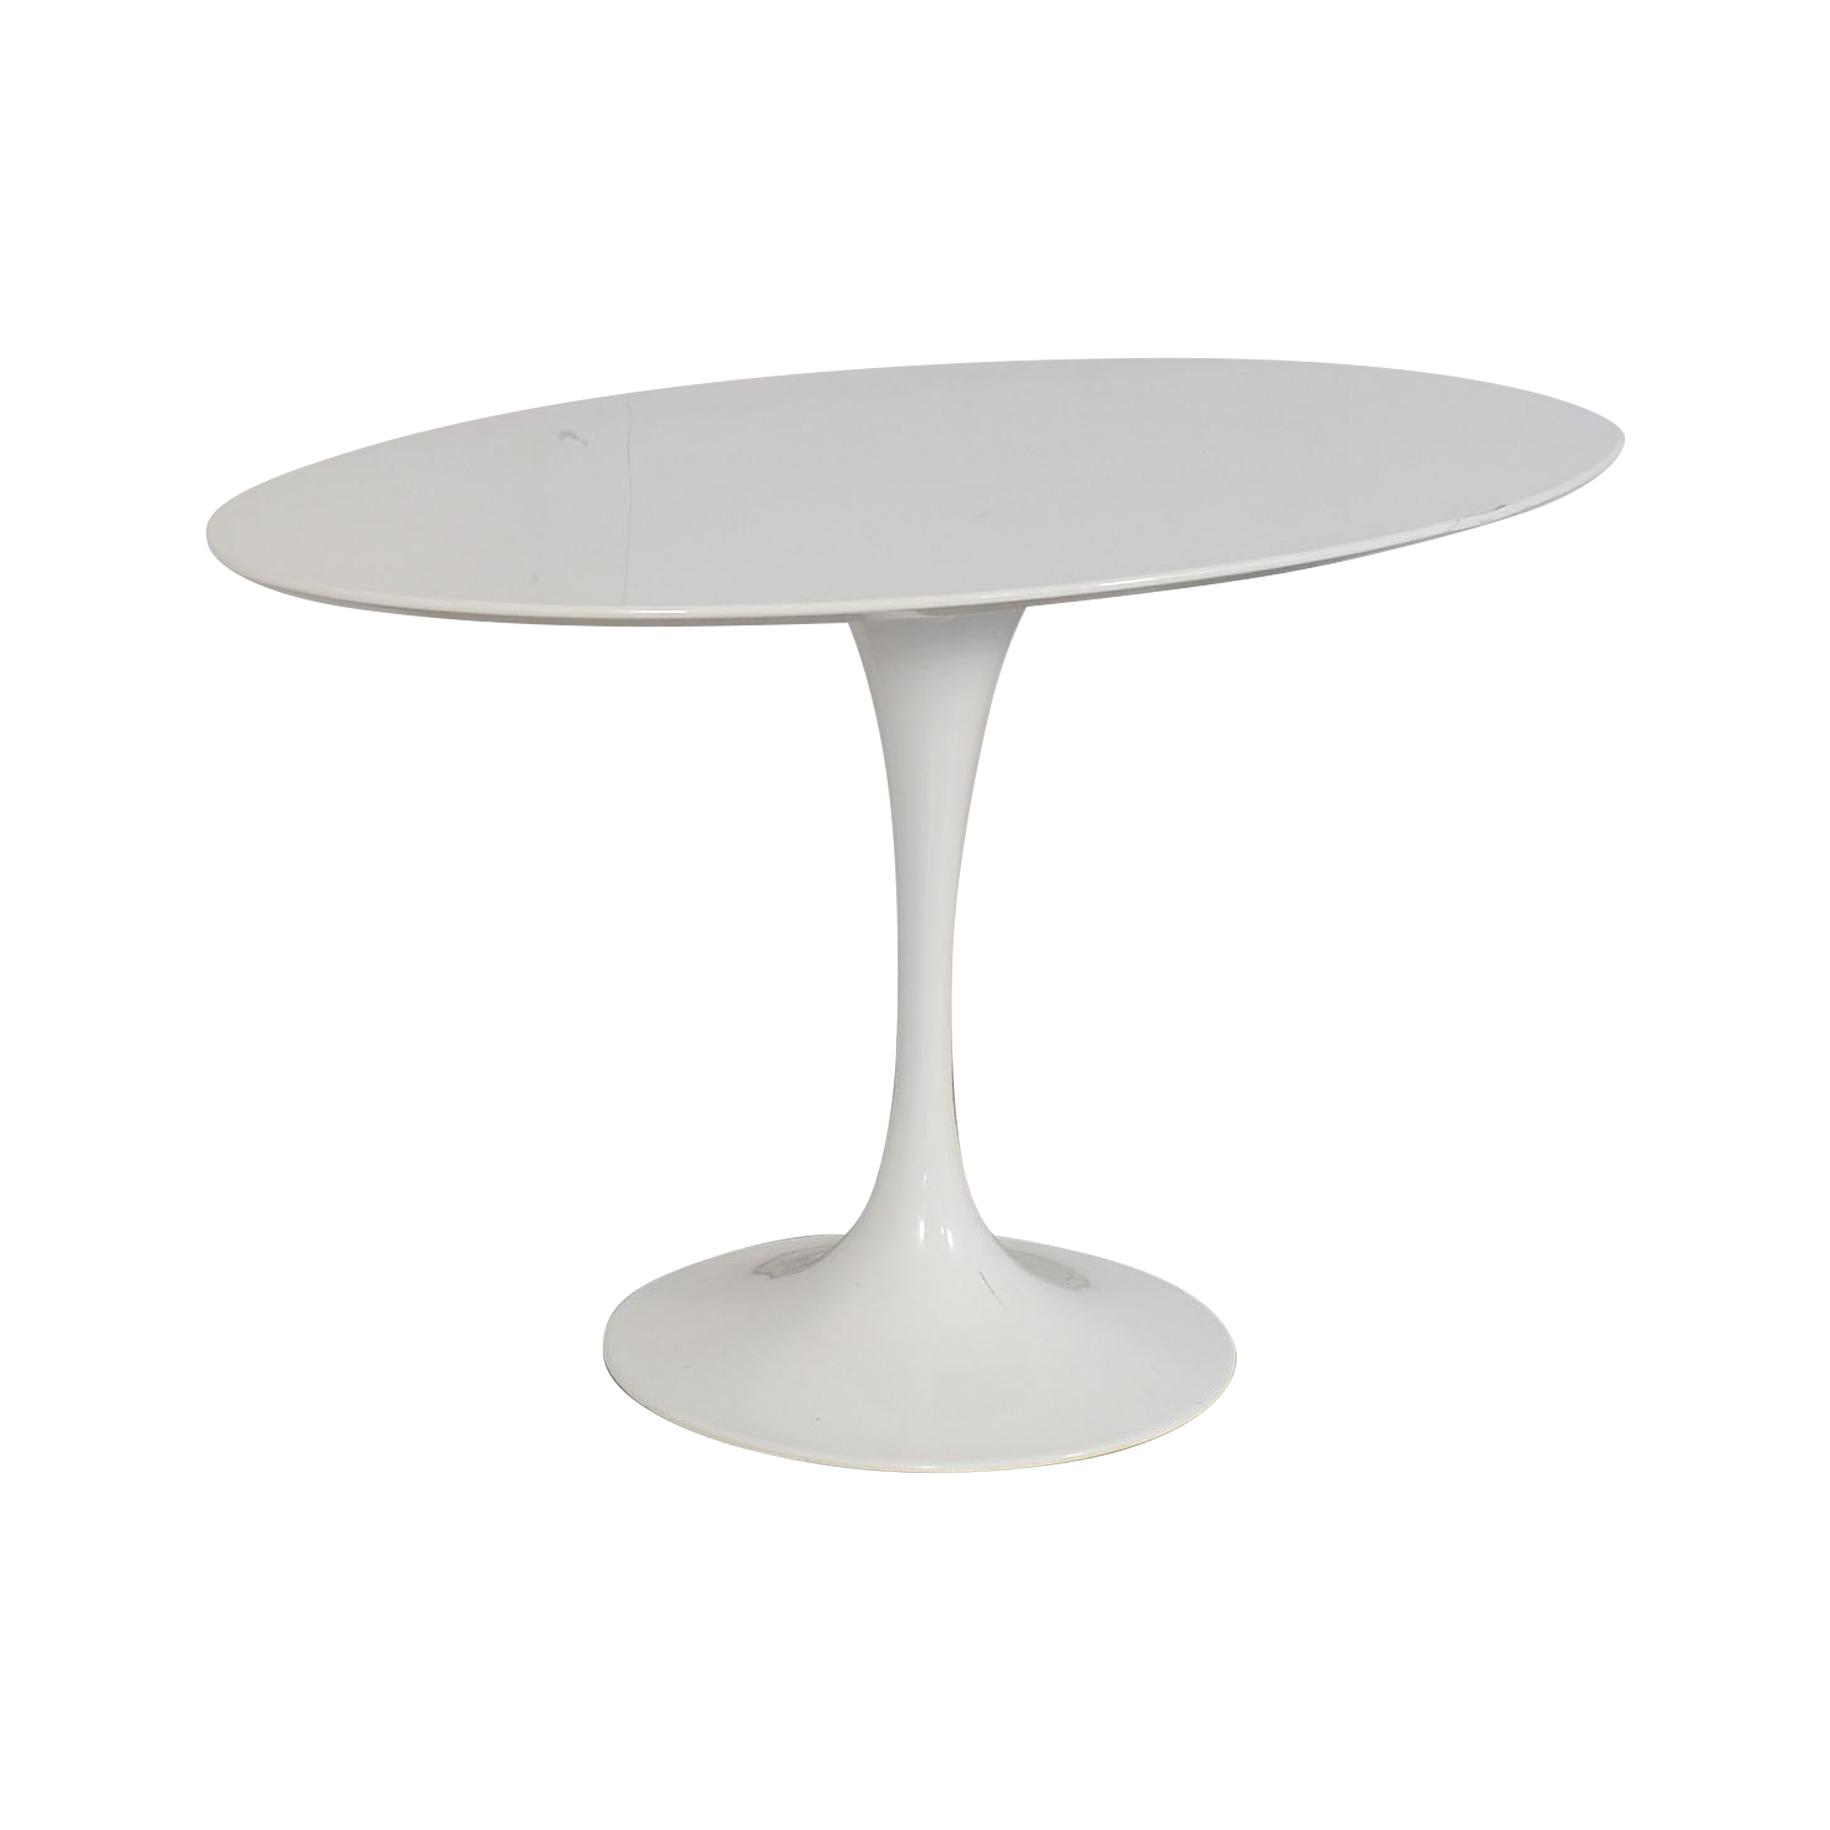 LexMod LexMod Lippa Oval Dining Table nyc